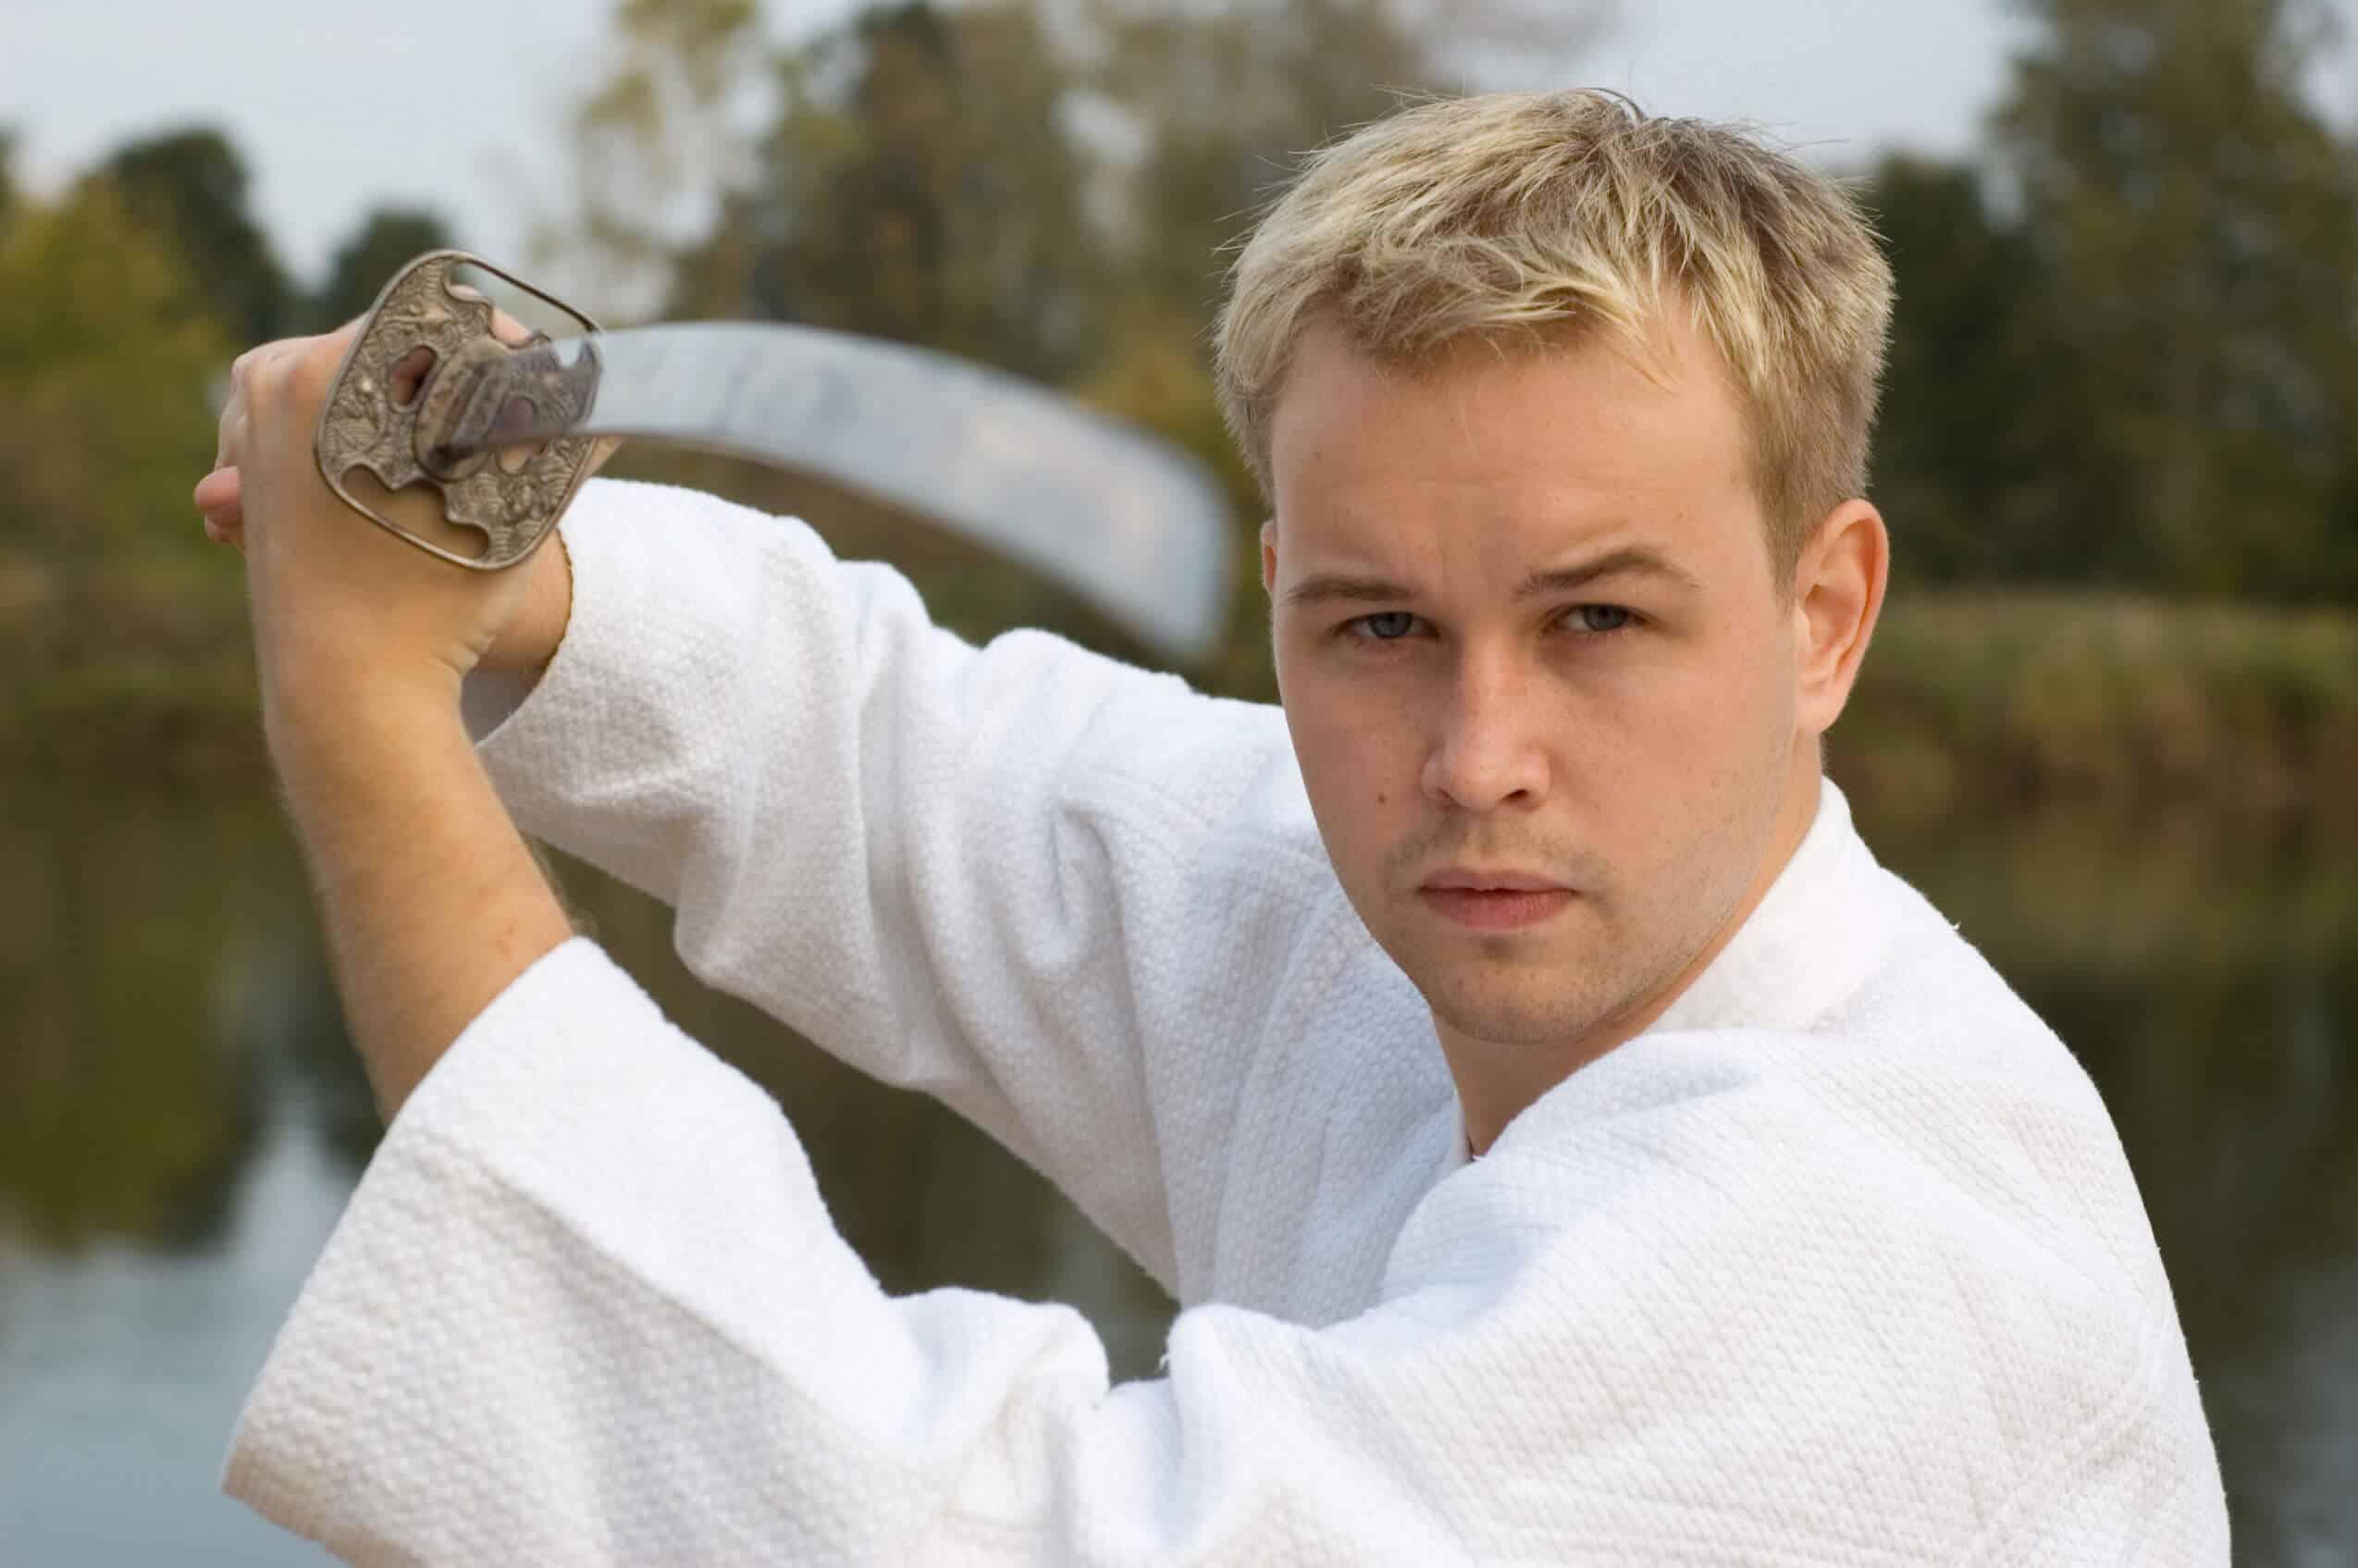 Martial Arts Lessons for Adults in Columbia MO - Samurai Sword Posing Blog